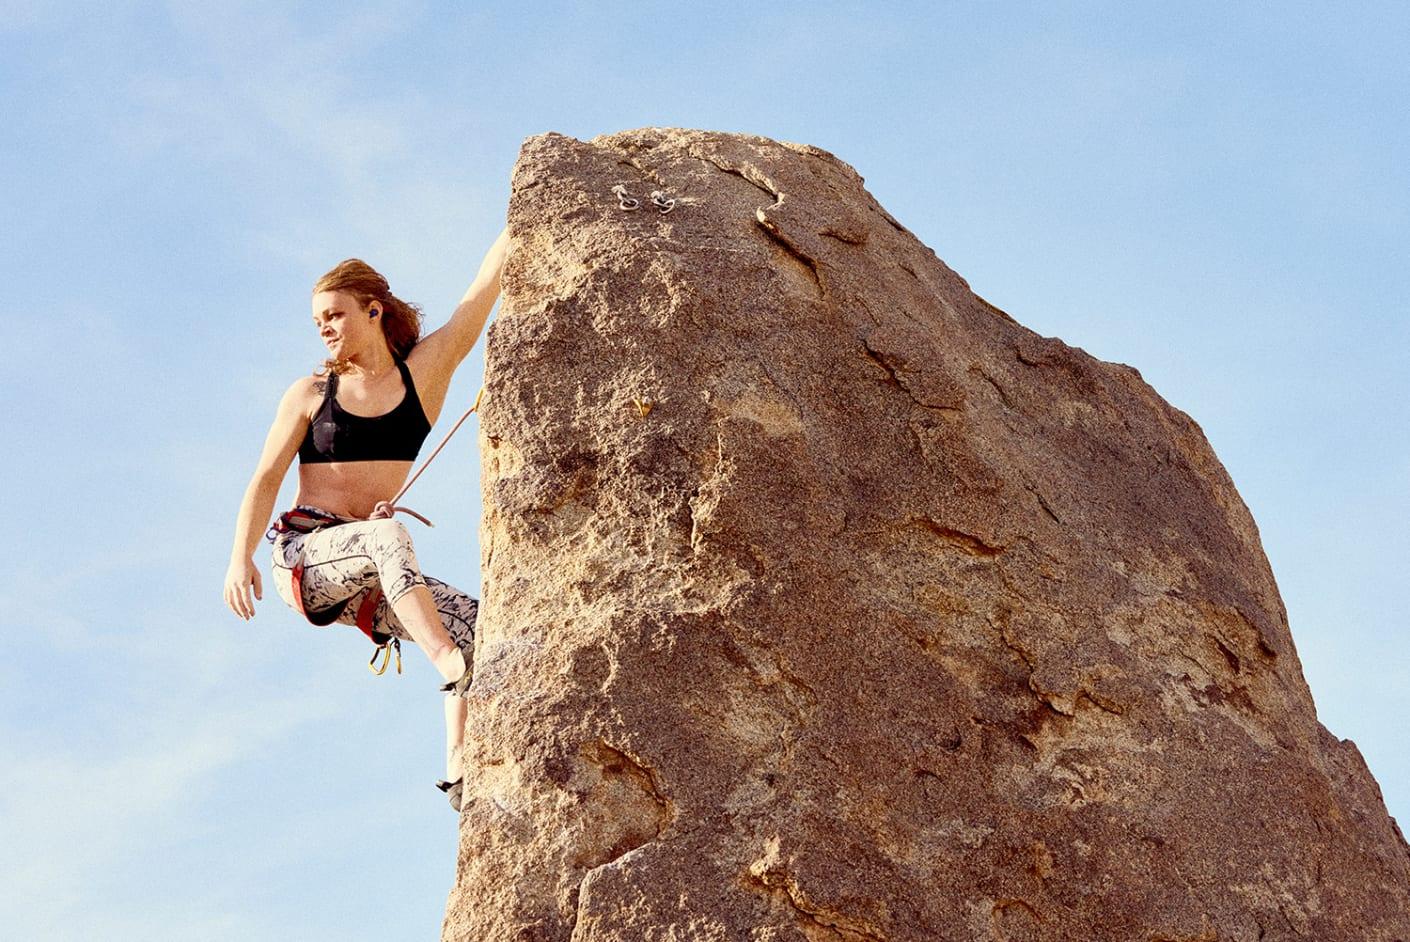 Jaybird Athlete climbing with Vista 2